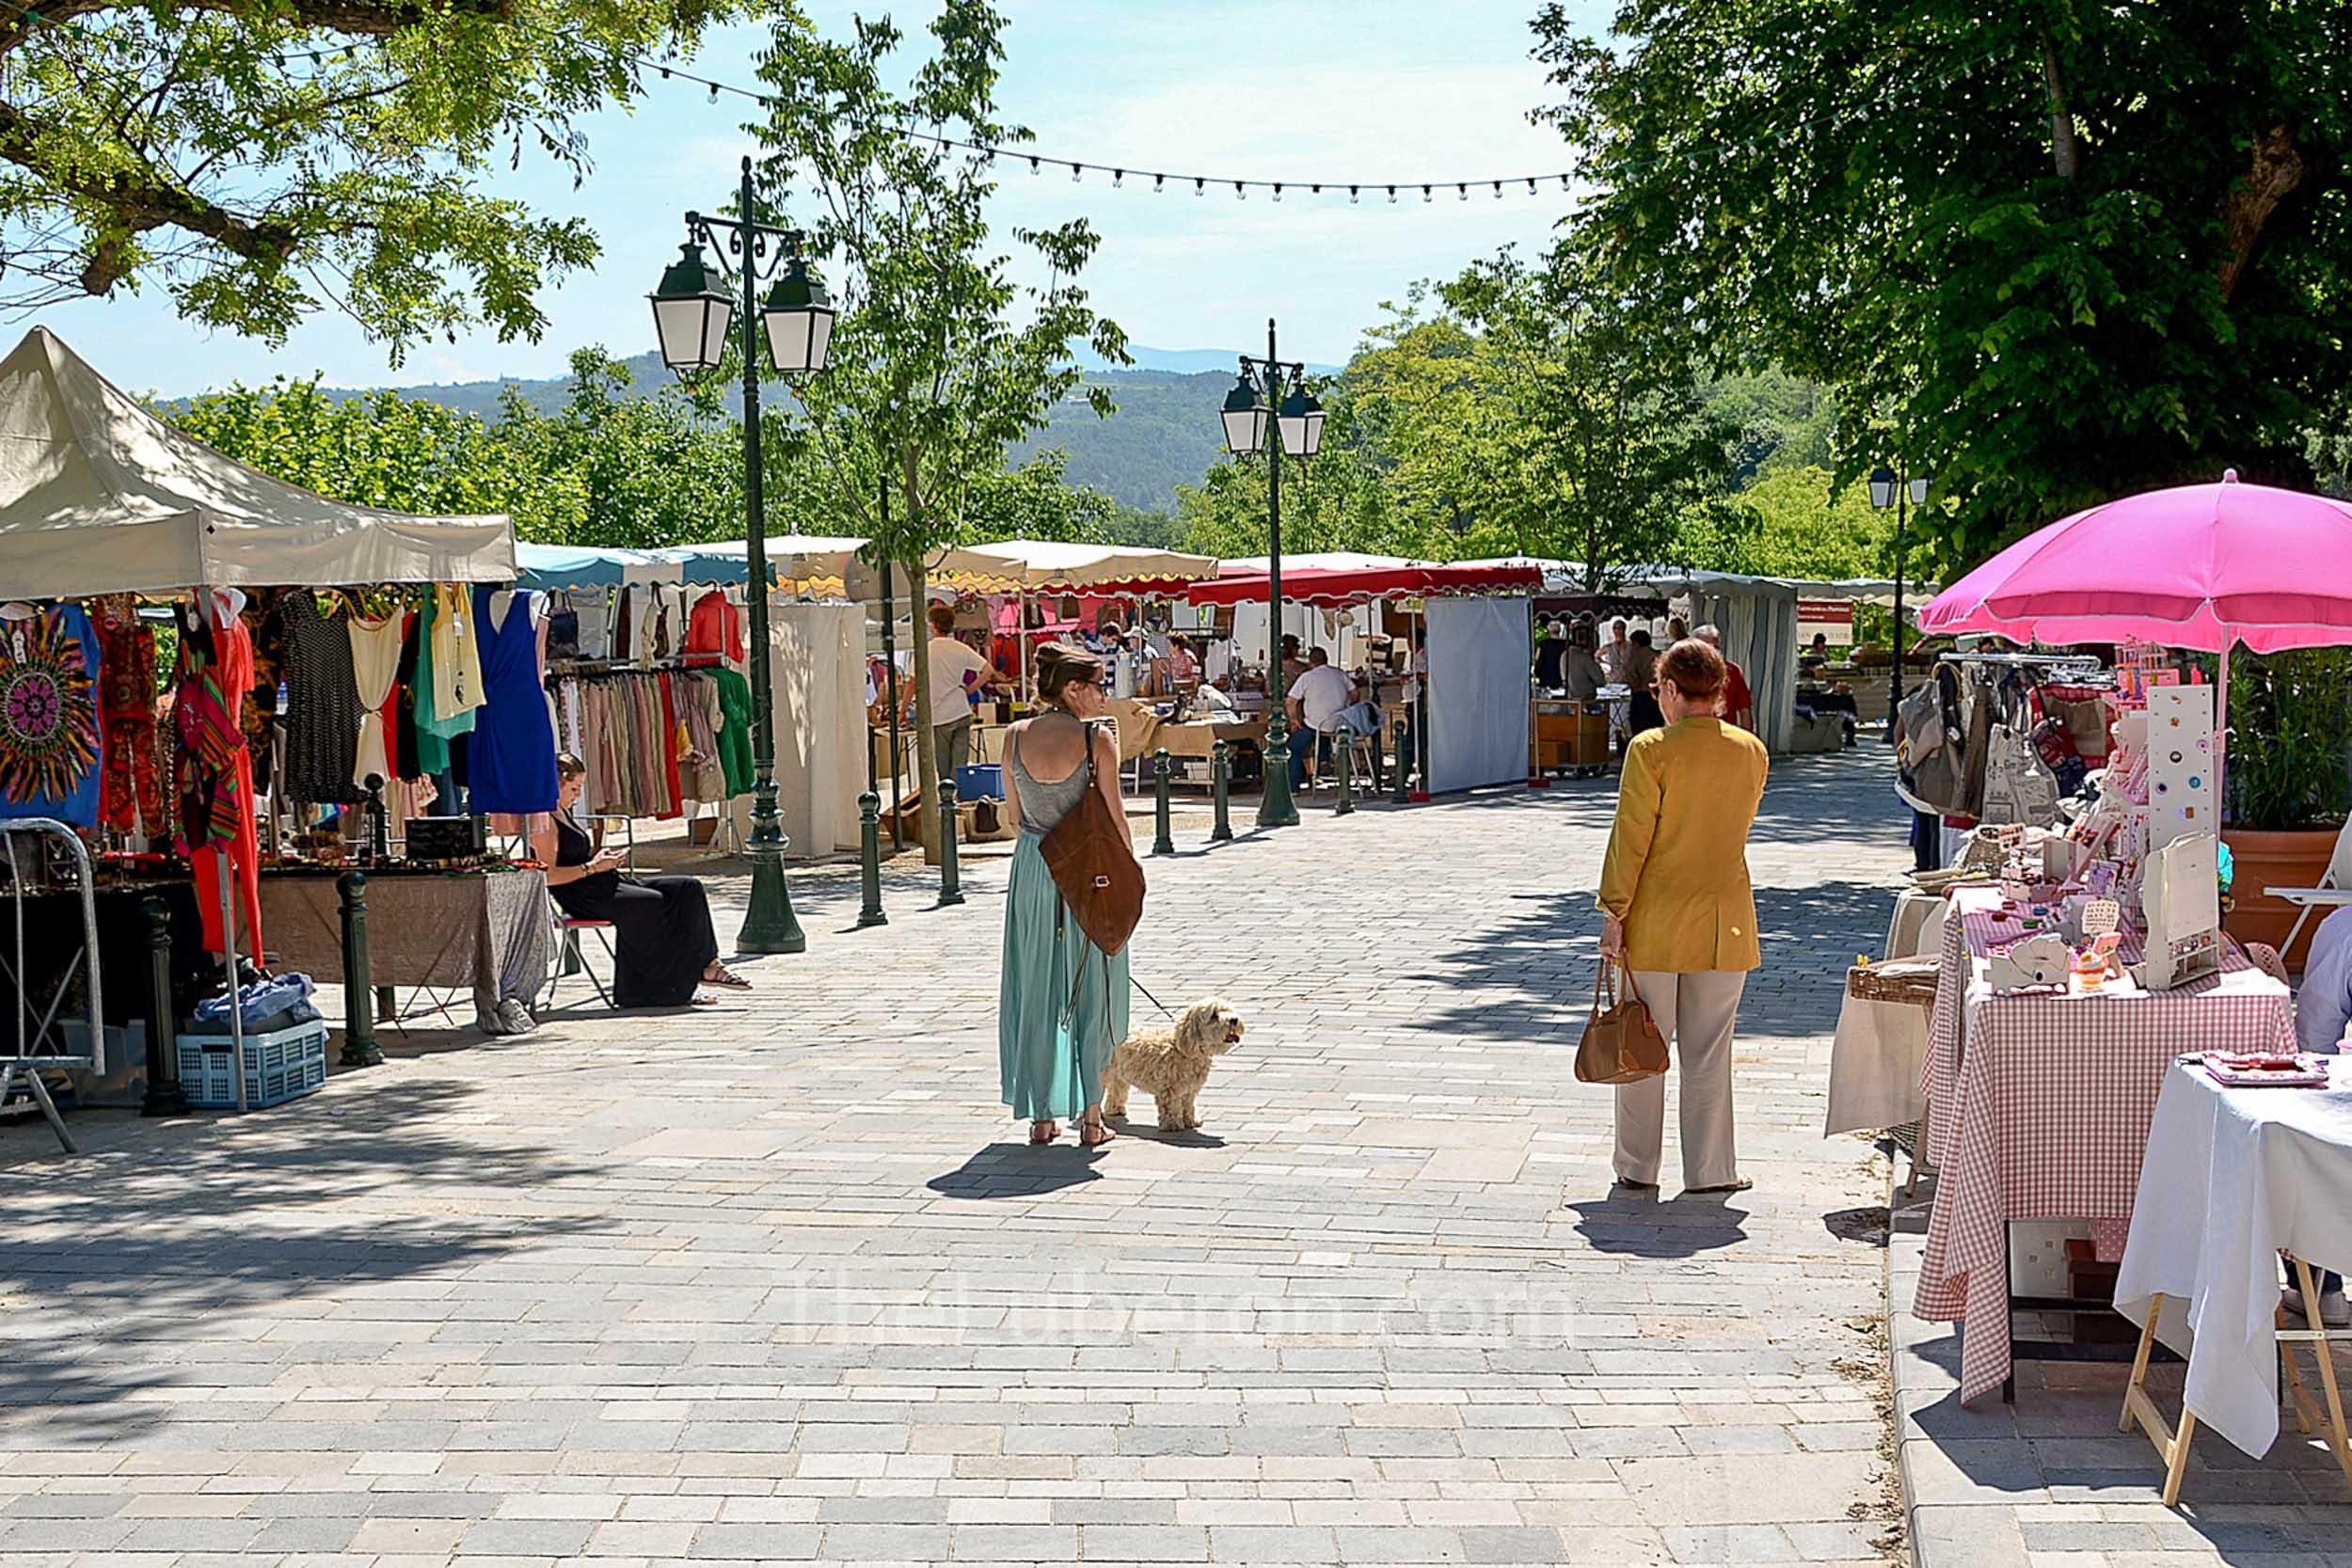 Sunny day at Menerbes market